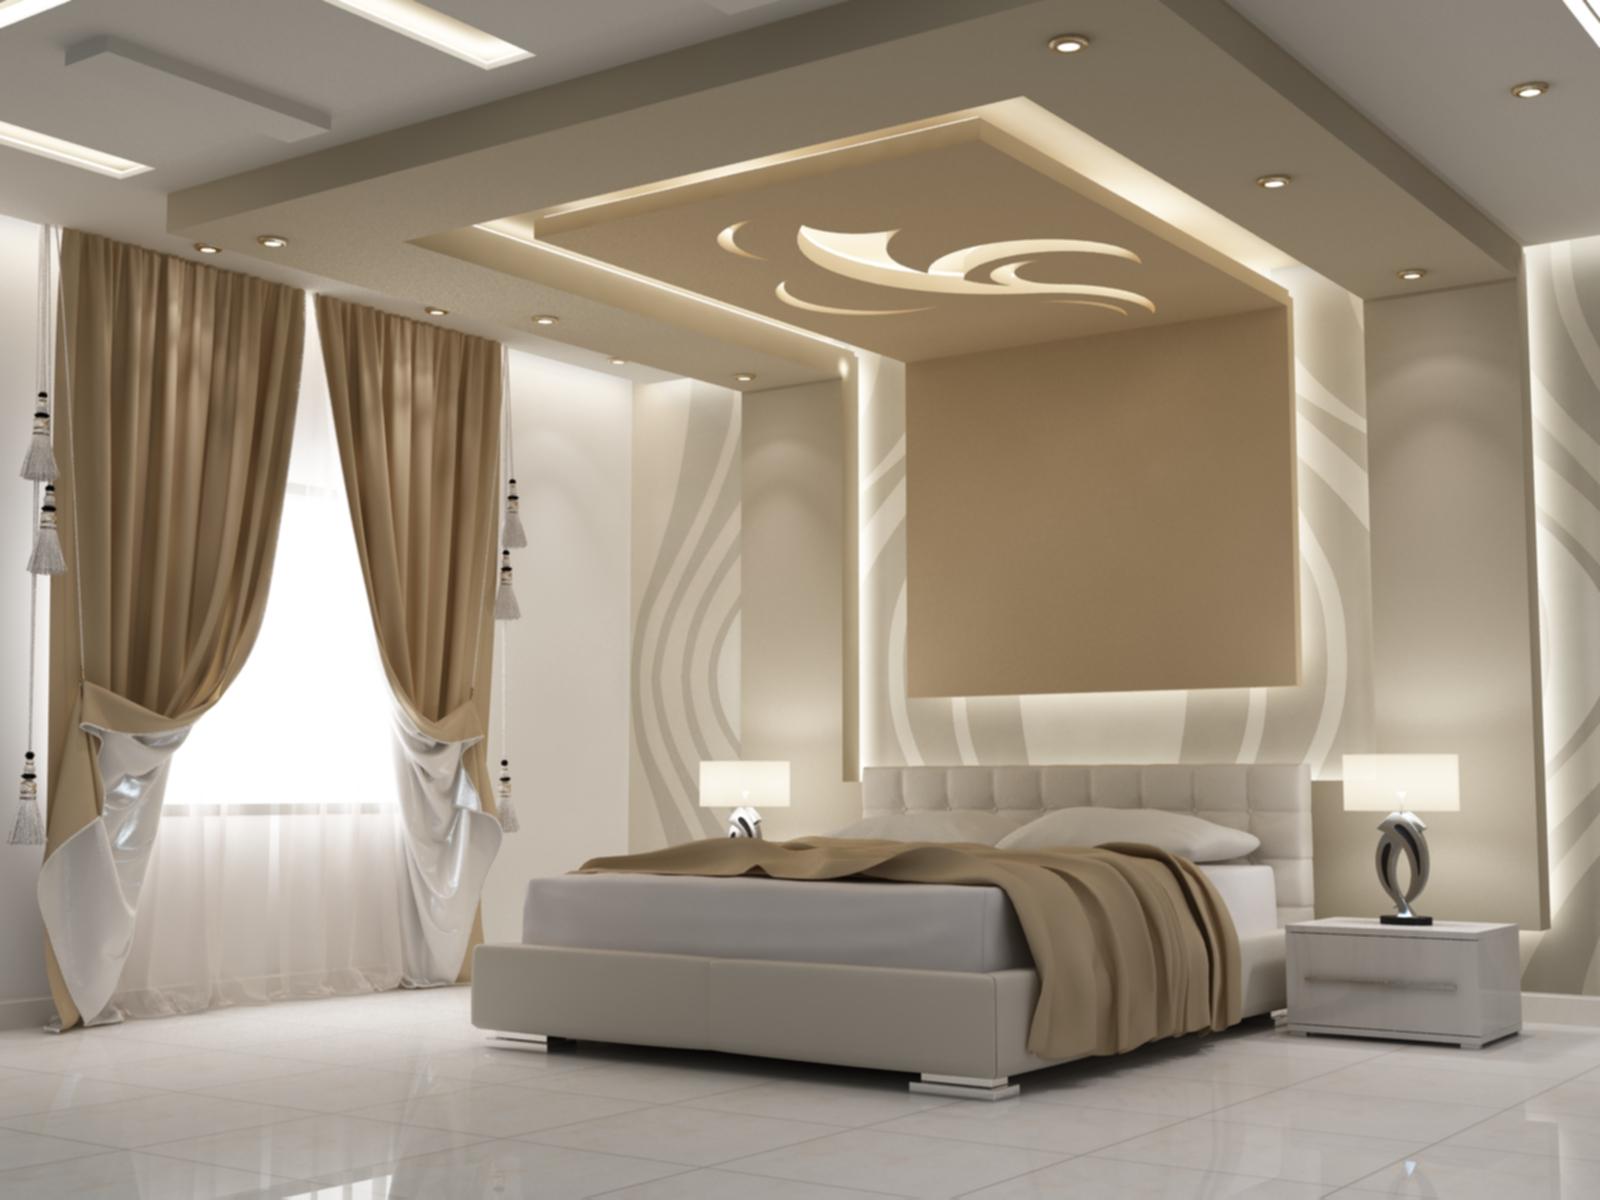 بالصور ديكورات غرف نوم للعرسان , احدث موديلات غرف النوم 3227 11